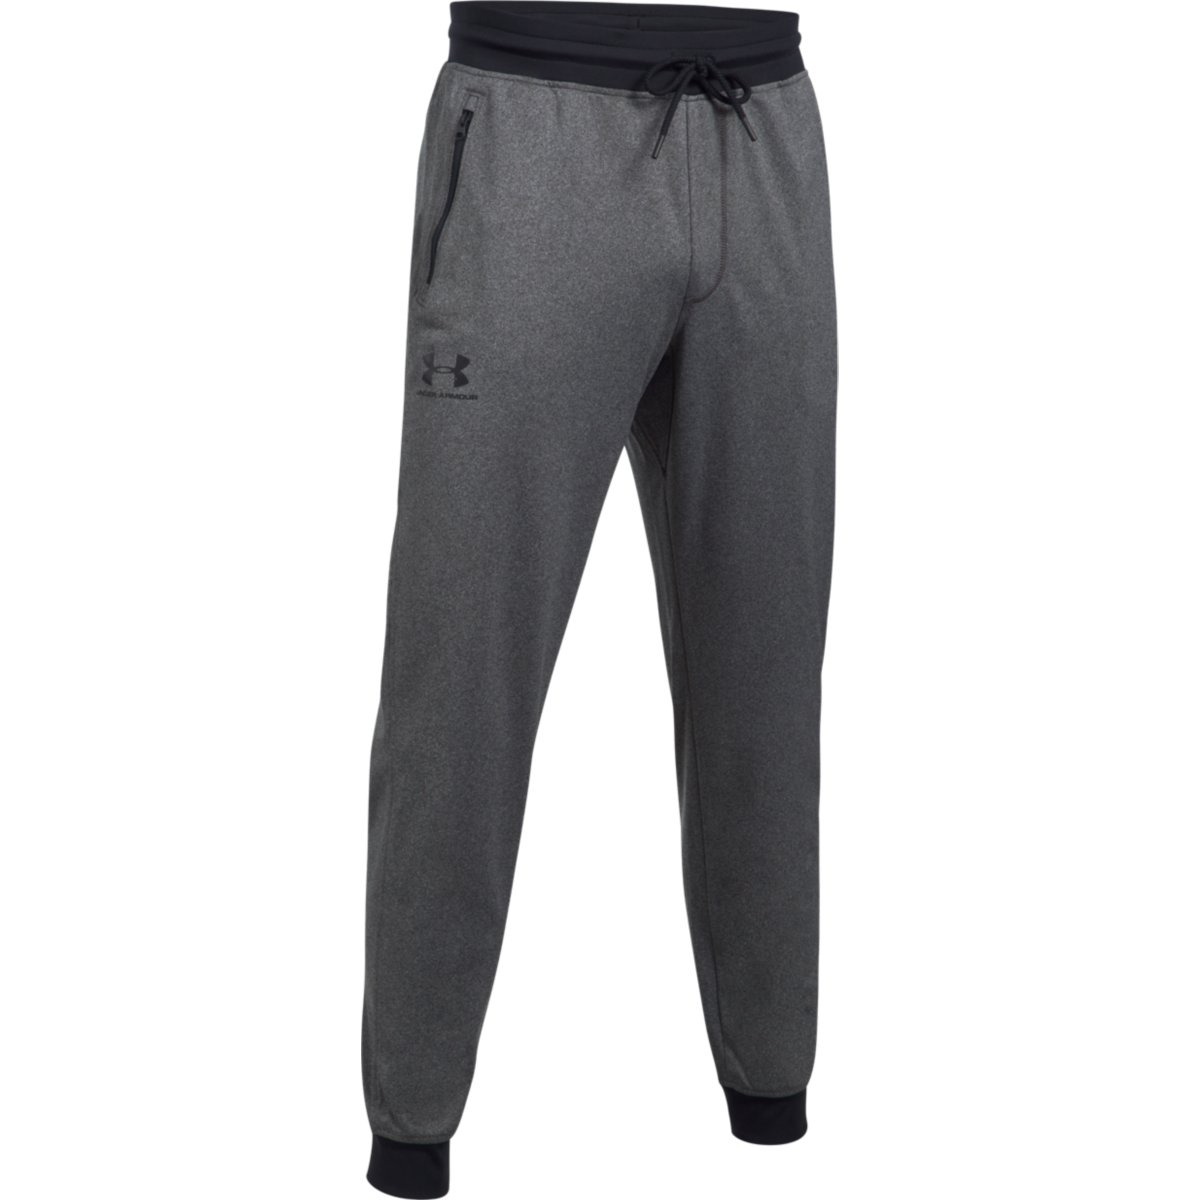 Under Armour Men's Sportstyle Jogger Pants - Black, XXL